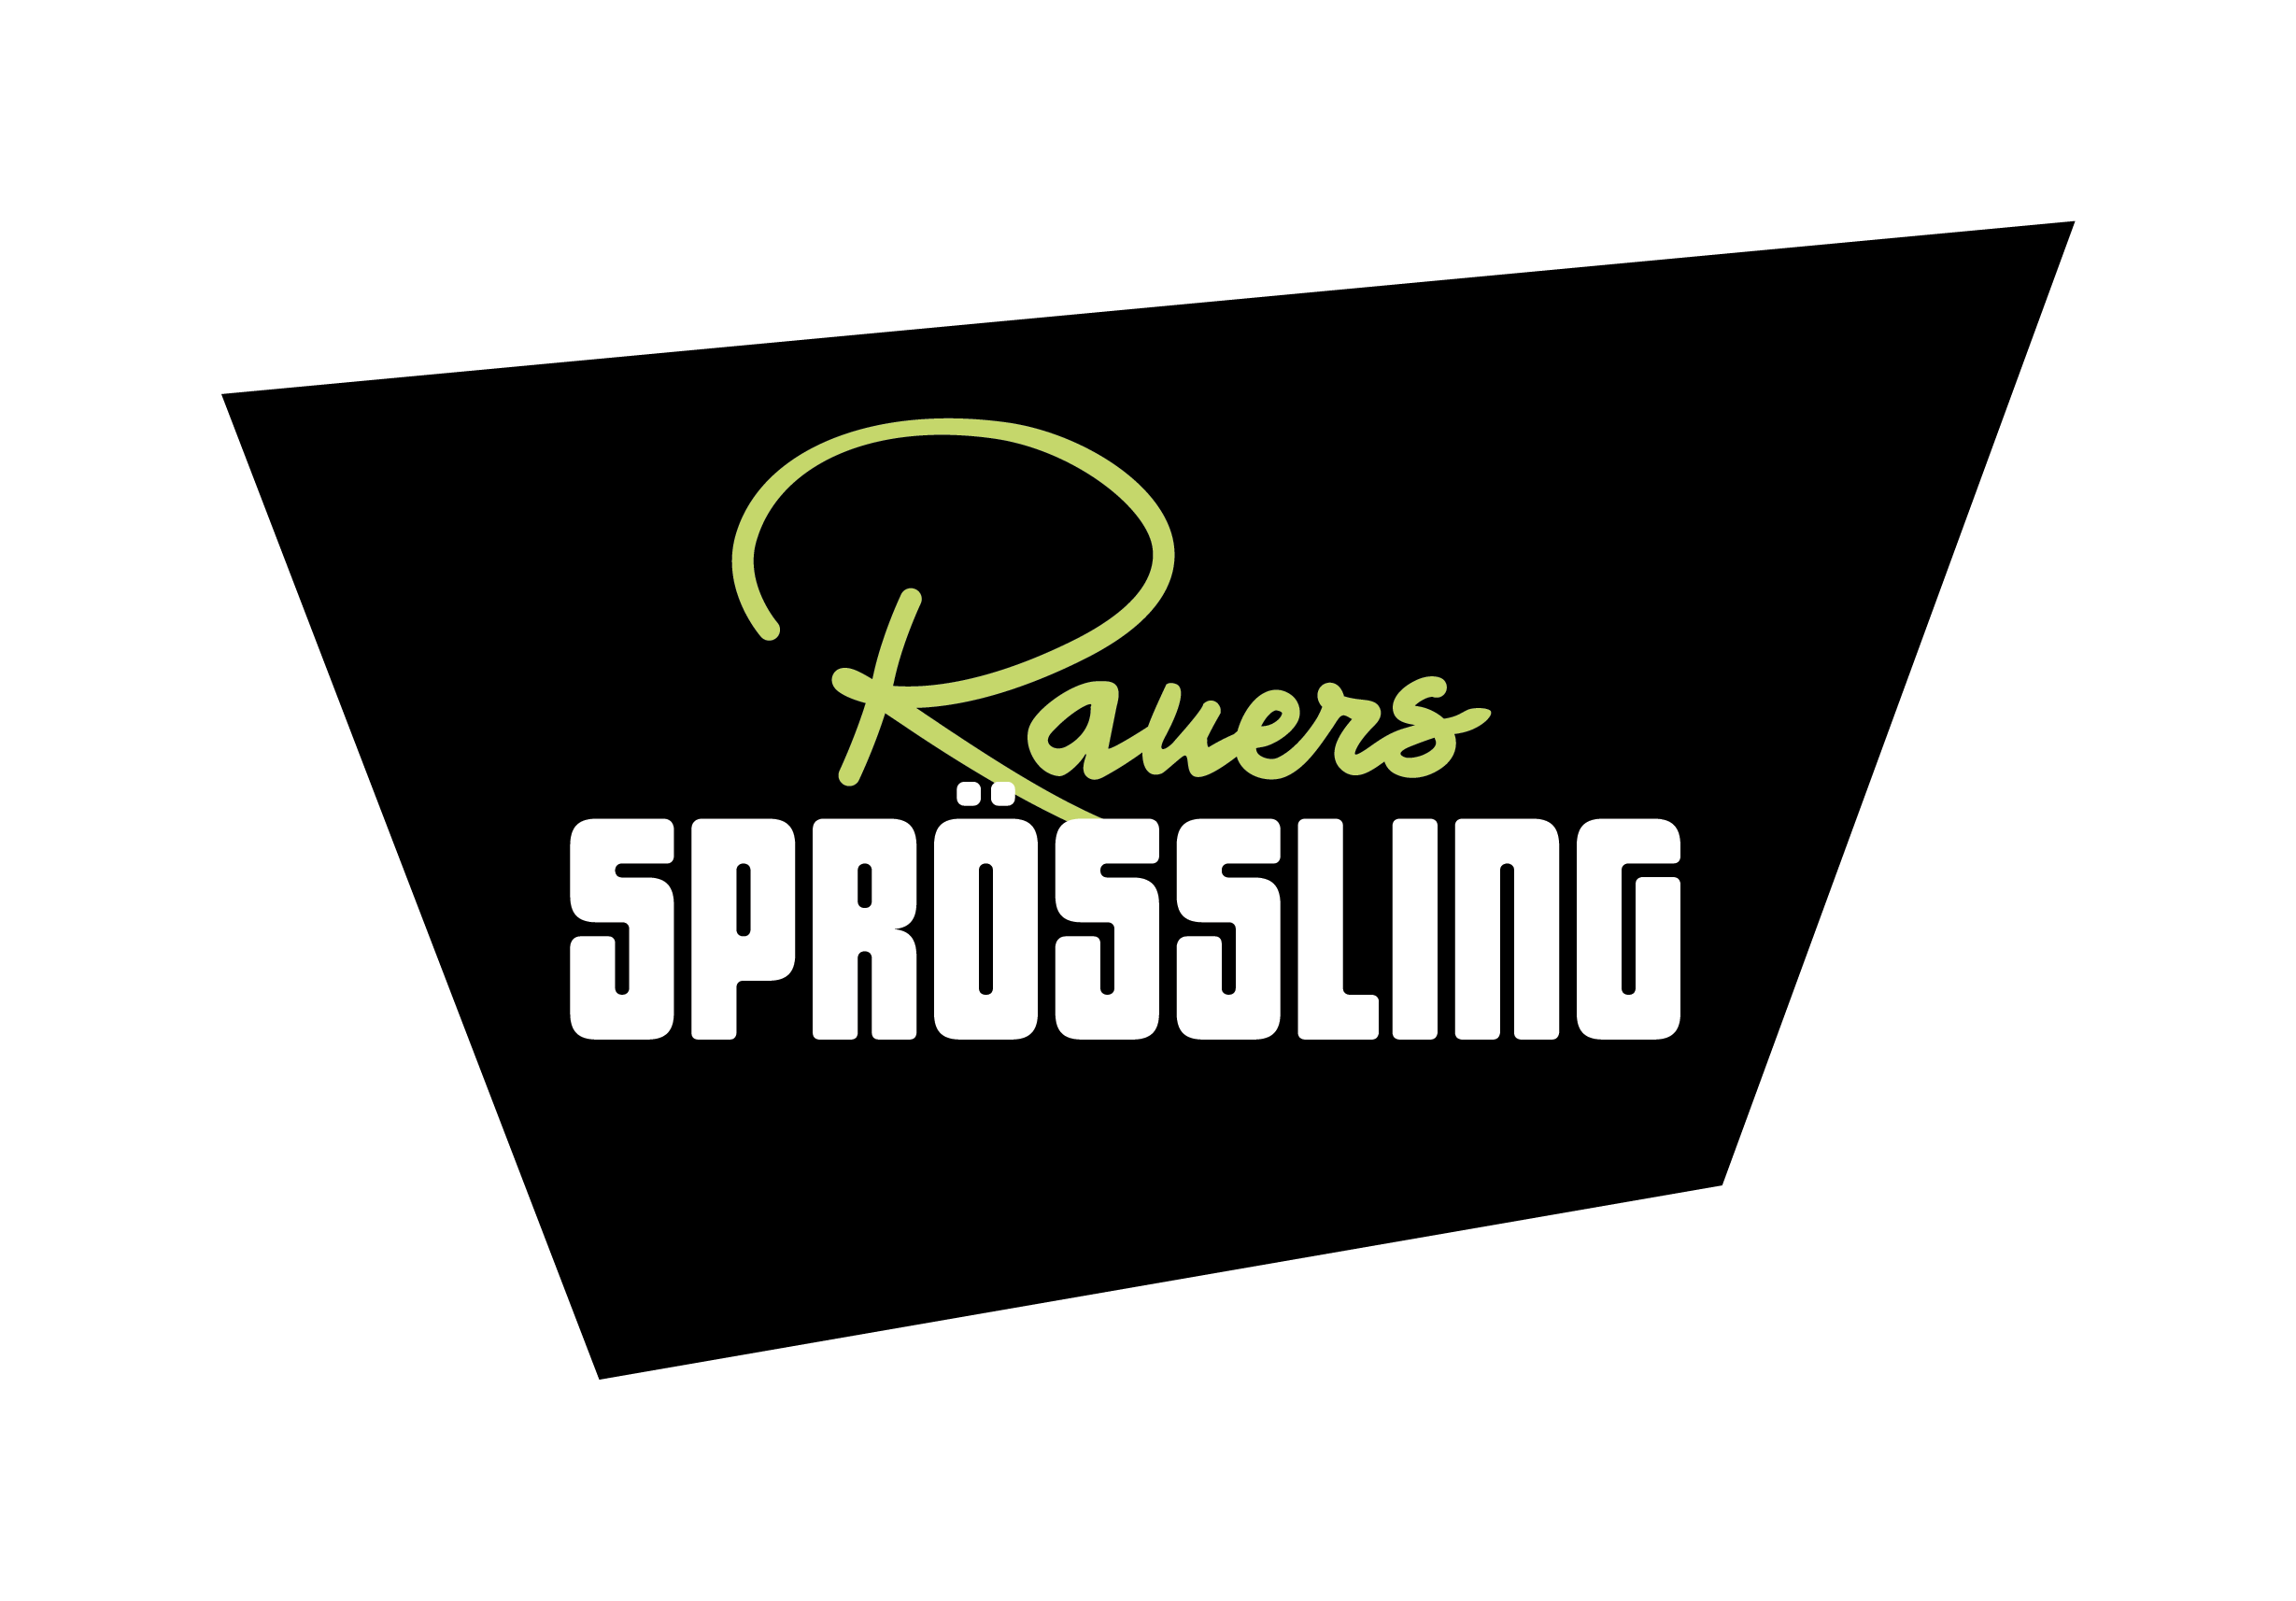 RZ_RS_Logo_RGB_5c8b27fe-533f-4529-9645-d748b3489aa5